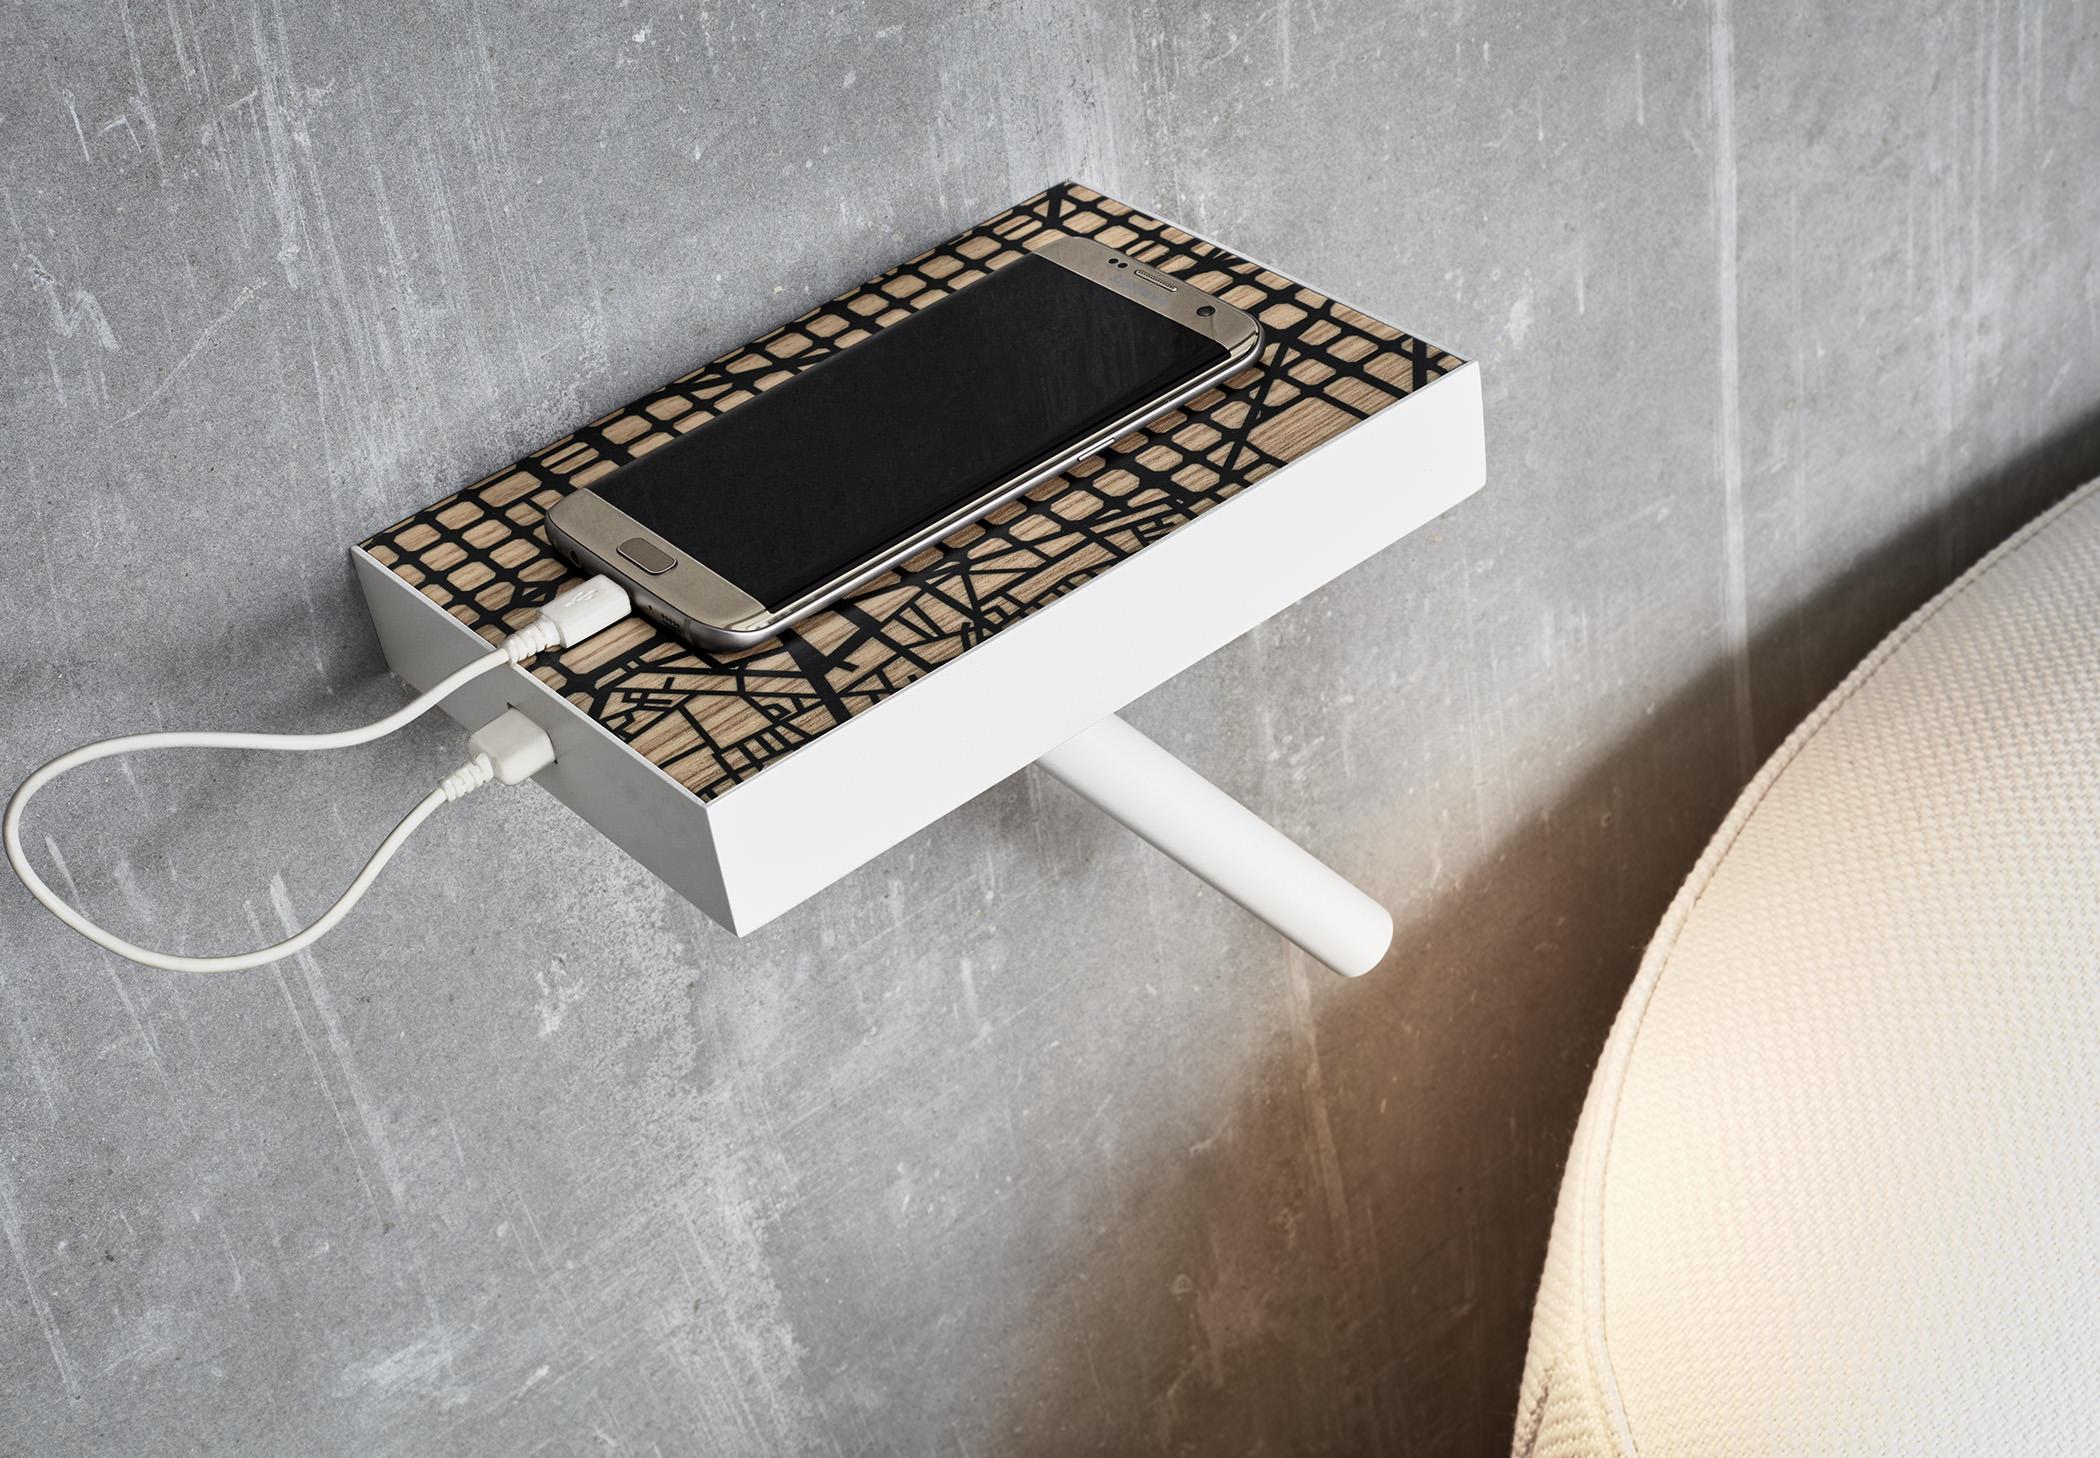 Nit A 3520 Wall Lamp Estiluz Image Ambient 03